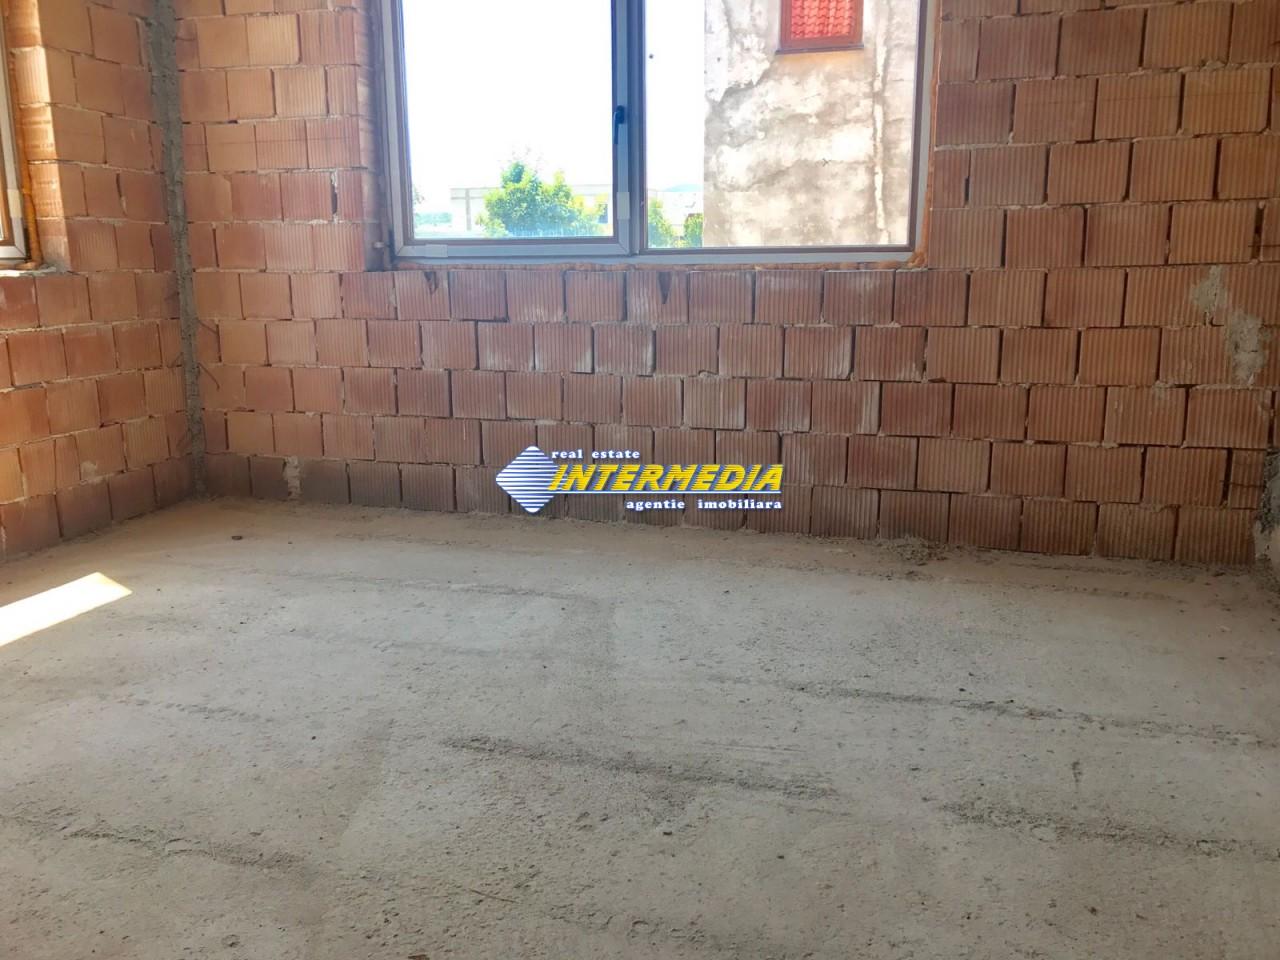 Casa in rosu de vanzare Alba Iulia cu utilitati-22465-7